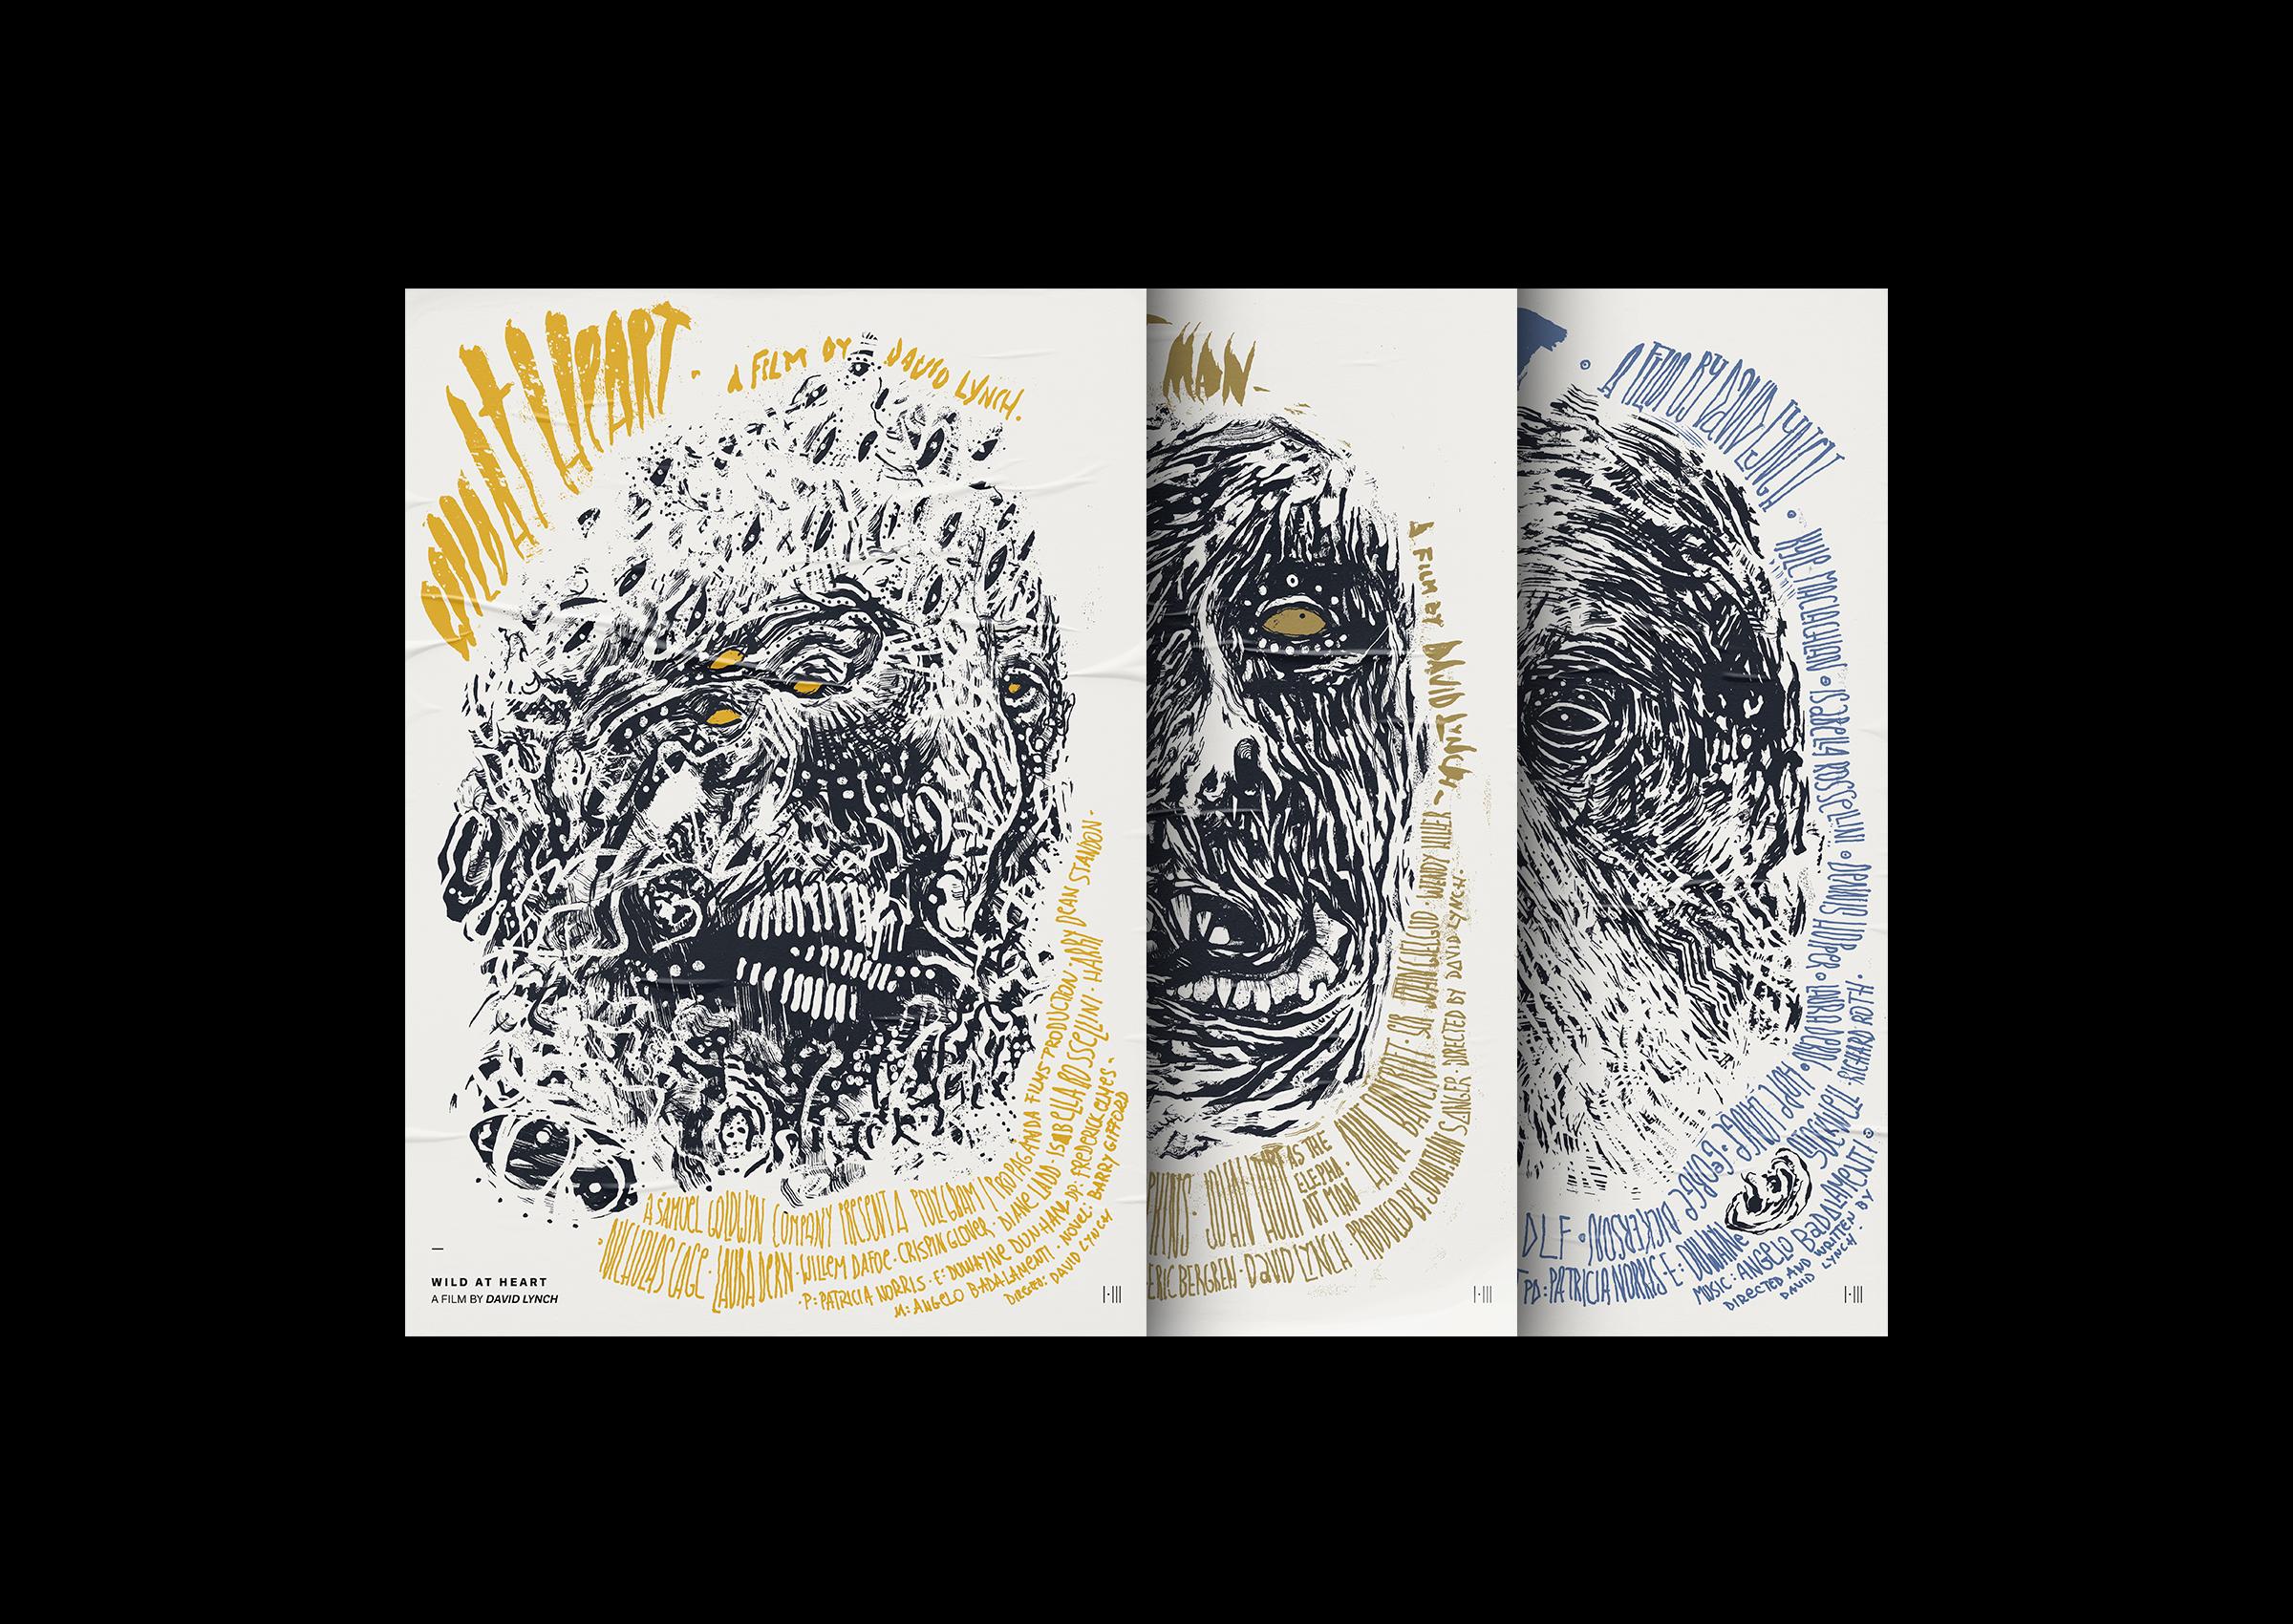 David Lynch Film Posters